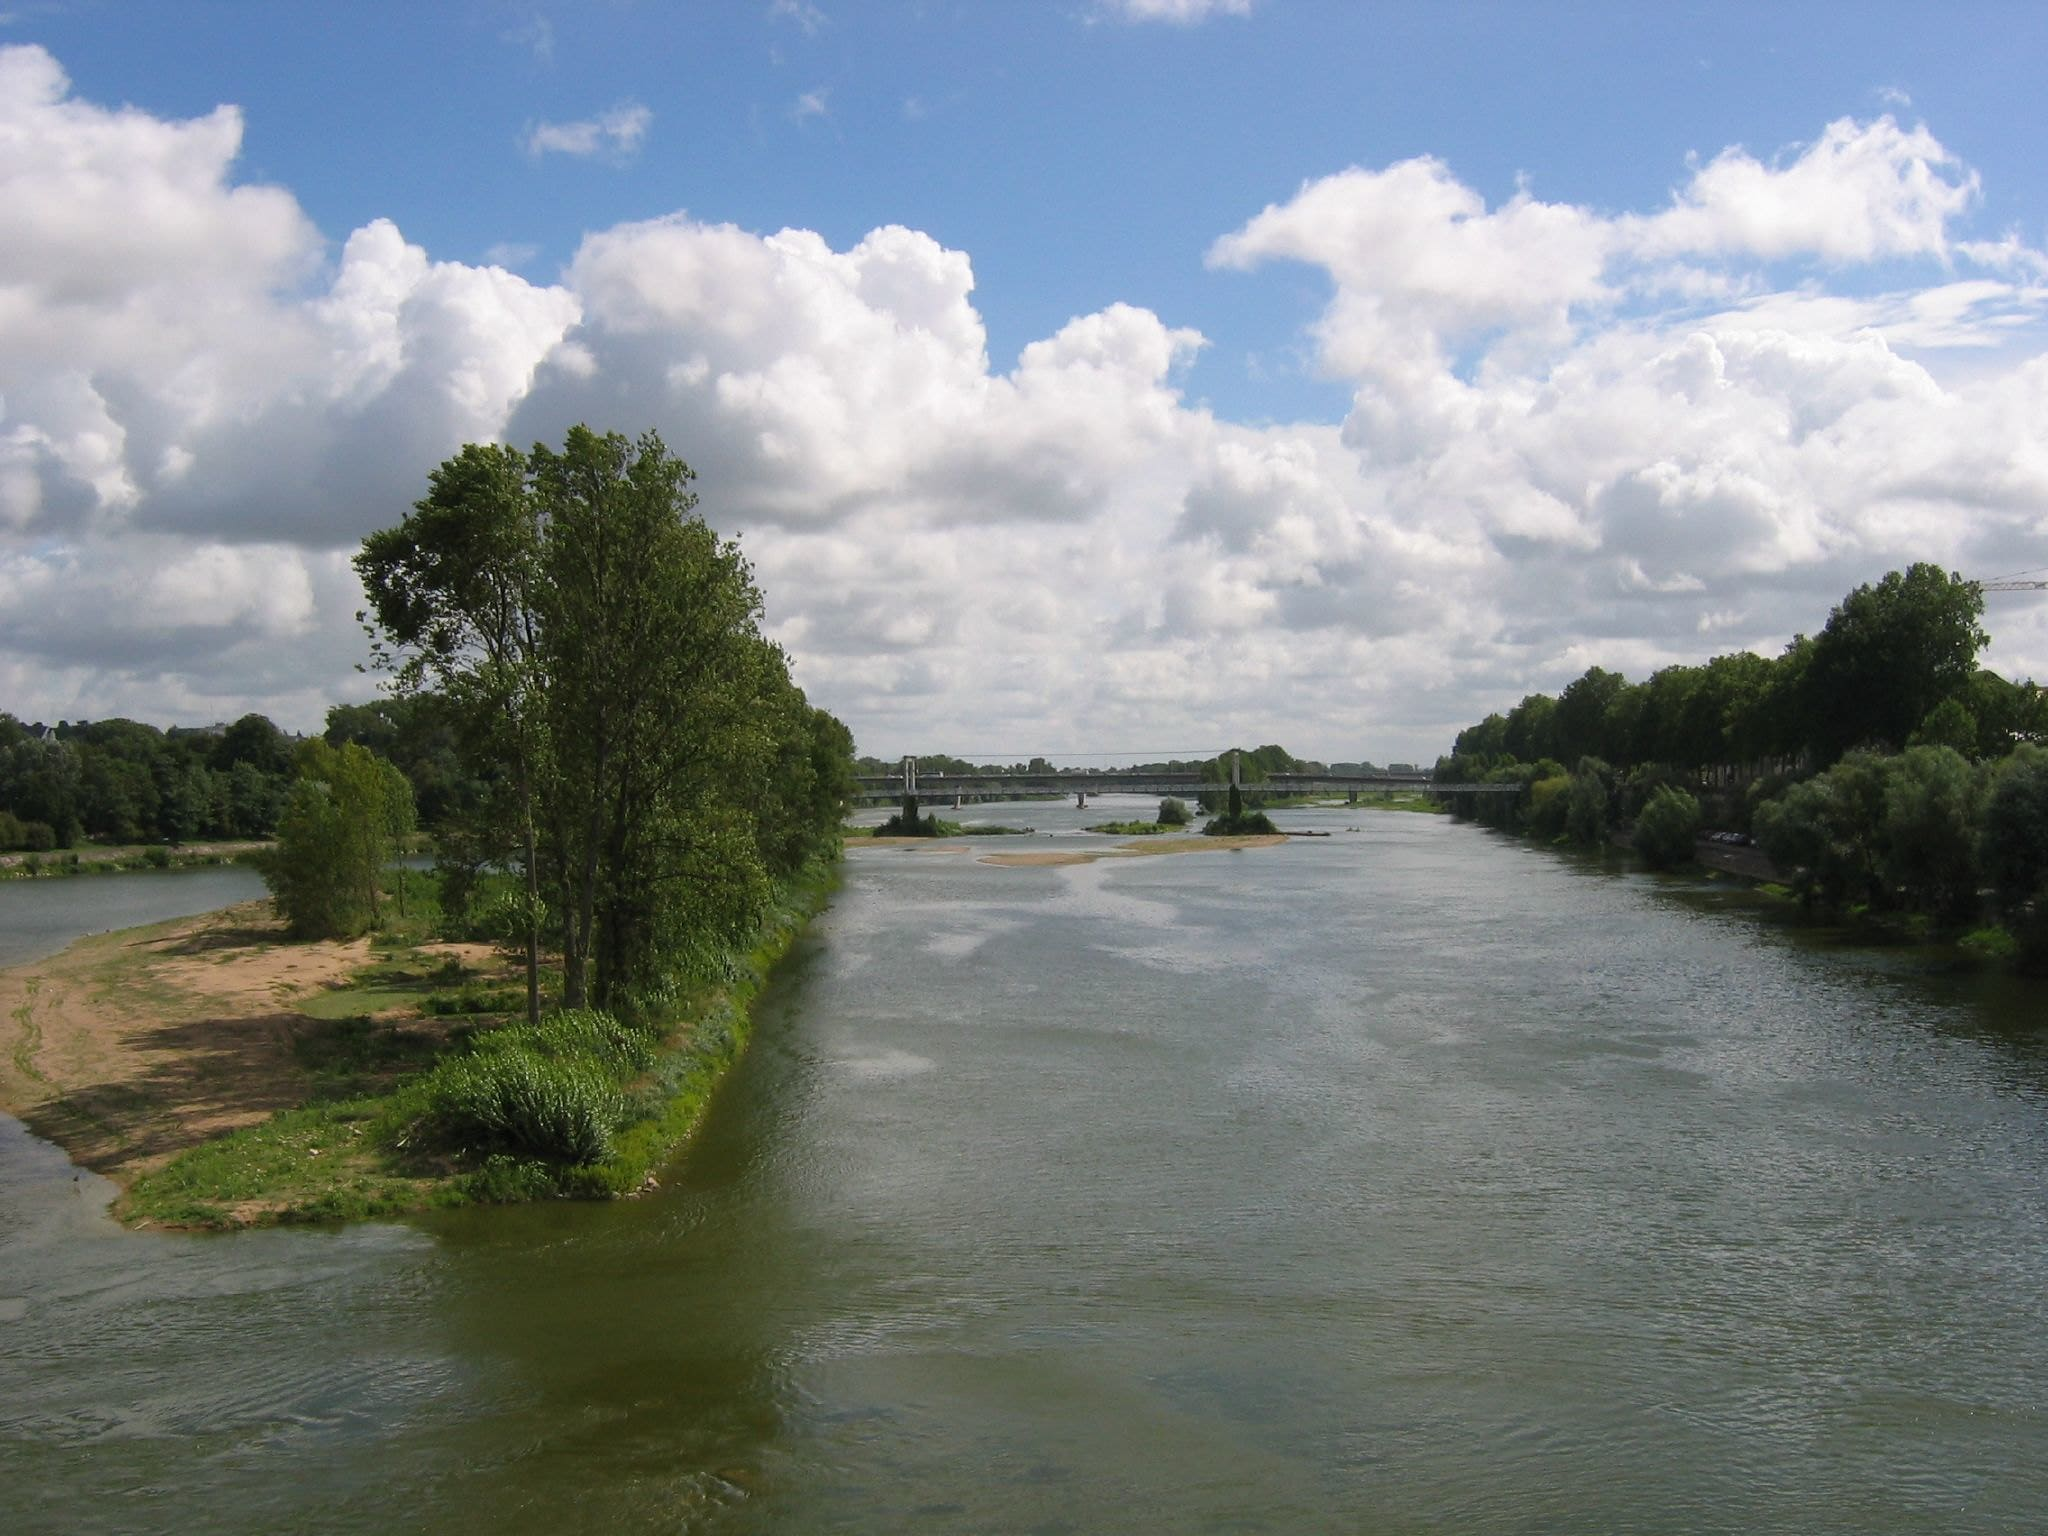 Garonna, tra i fiumi francesi